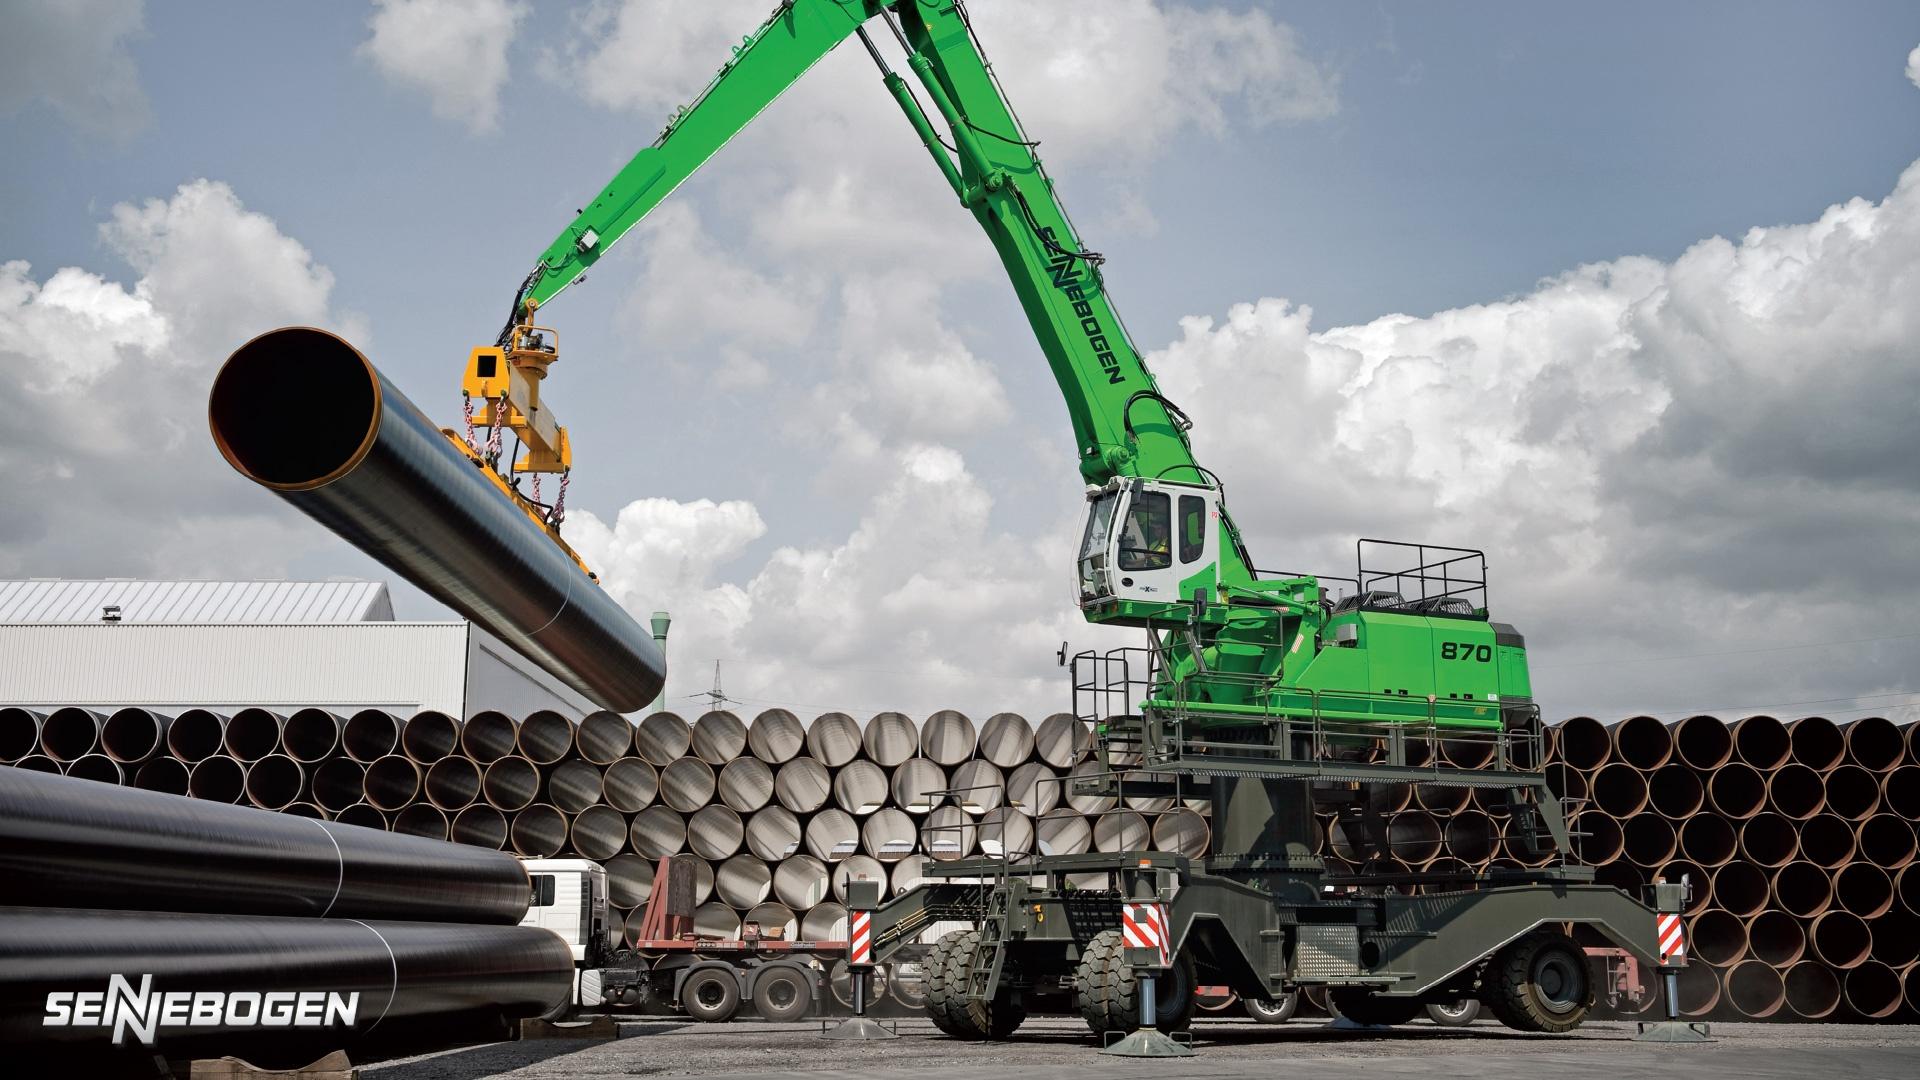 sennebogen machine handling pipes